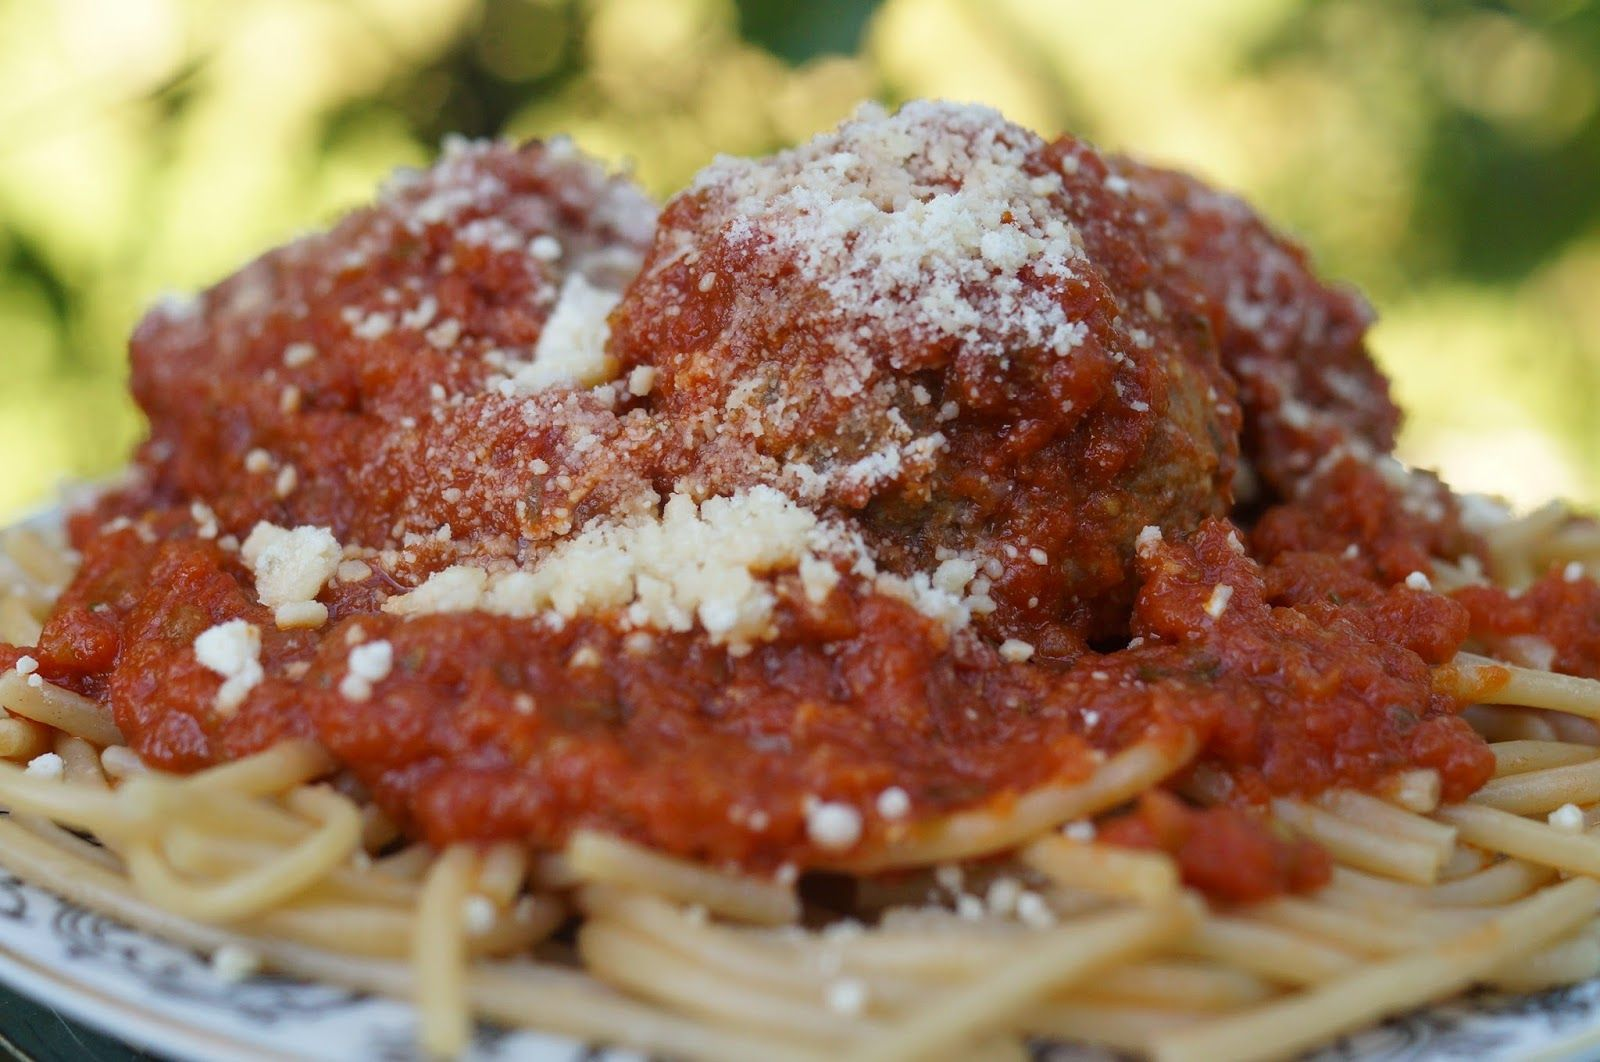 In the Kitchen with Jenny: Spaghetti Meatballs (with Gluten Free Options) #glutenfree @spaghetti #meatballs @inkitchenwjenny